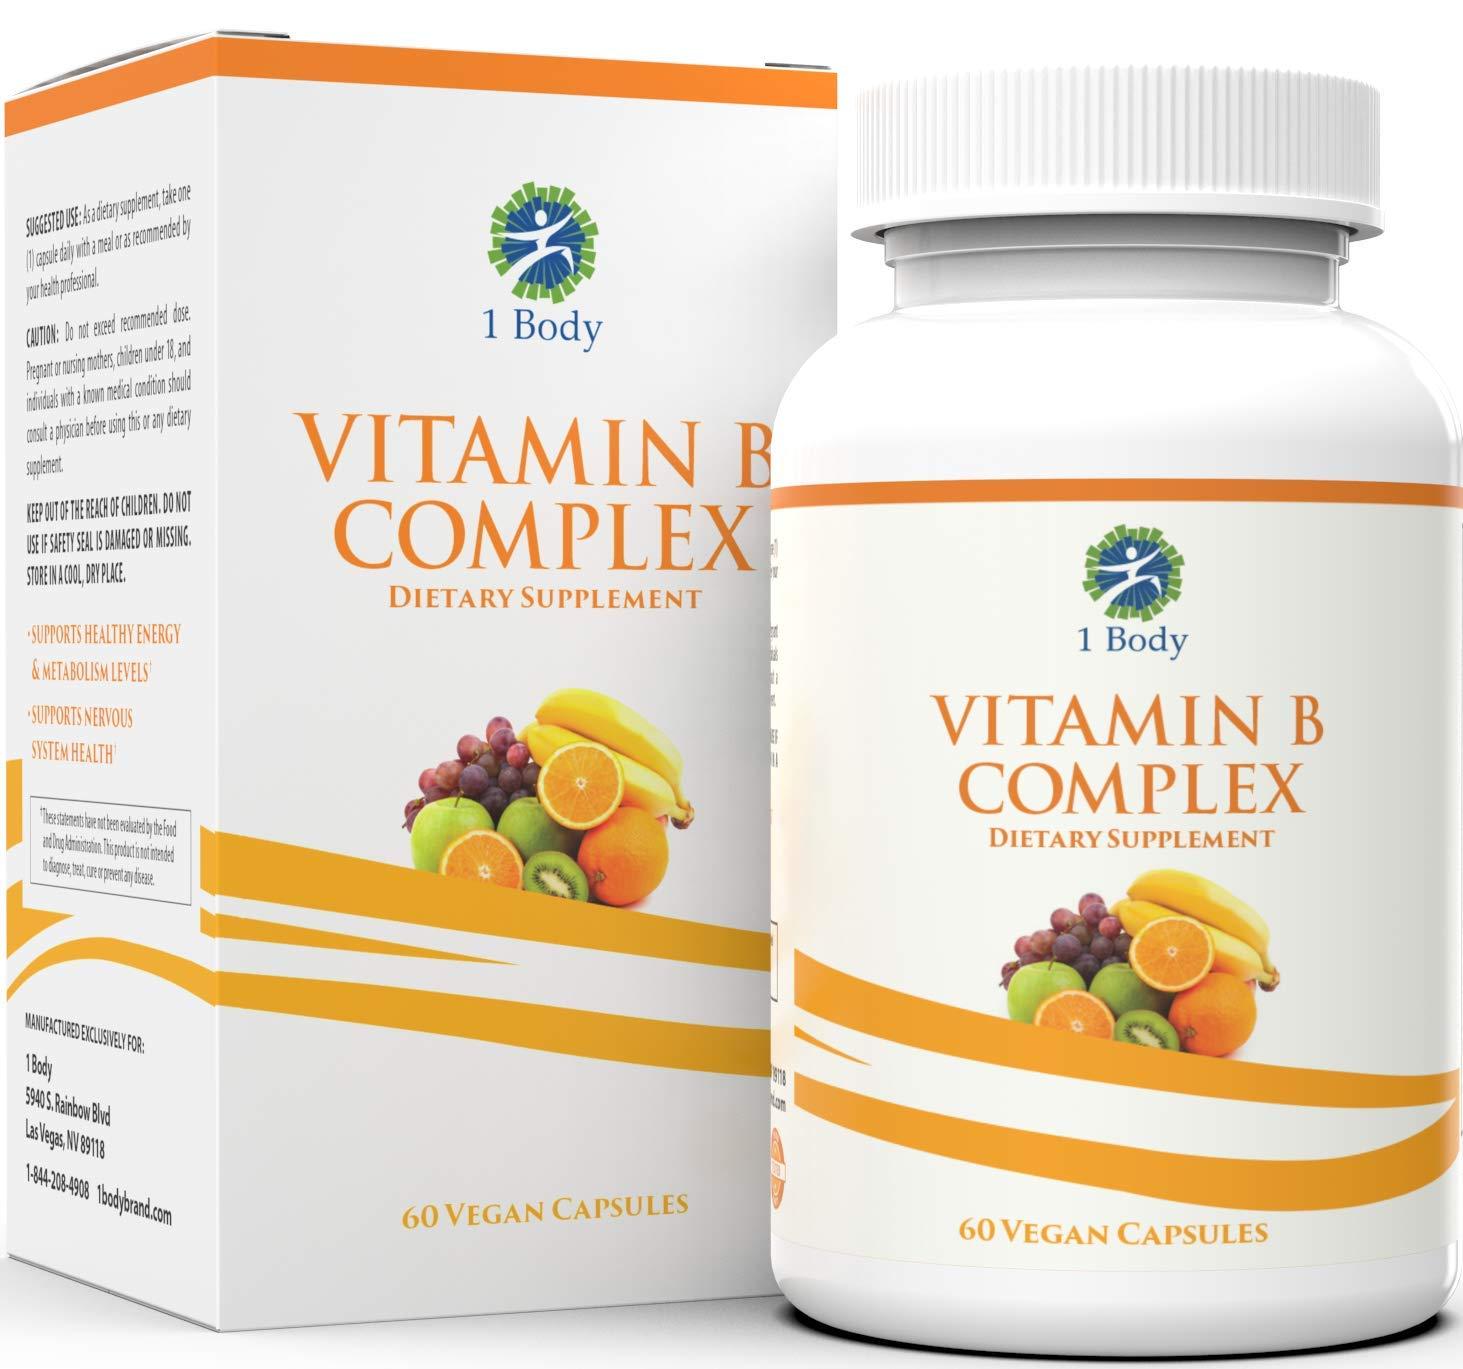 Vitamin B Complex - 5-MTHF Folate with B1, B2, B5, B6, Methyl B12, Niacin, Biotin - Wide Range of Benefits for Stress, Heart Health, Healthy Brain Function, Nervous System Support